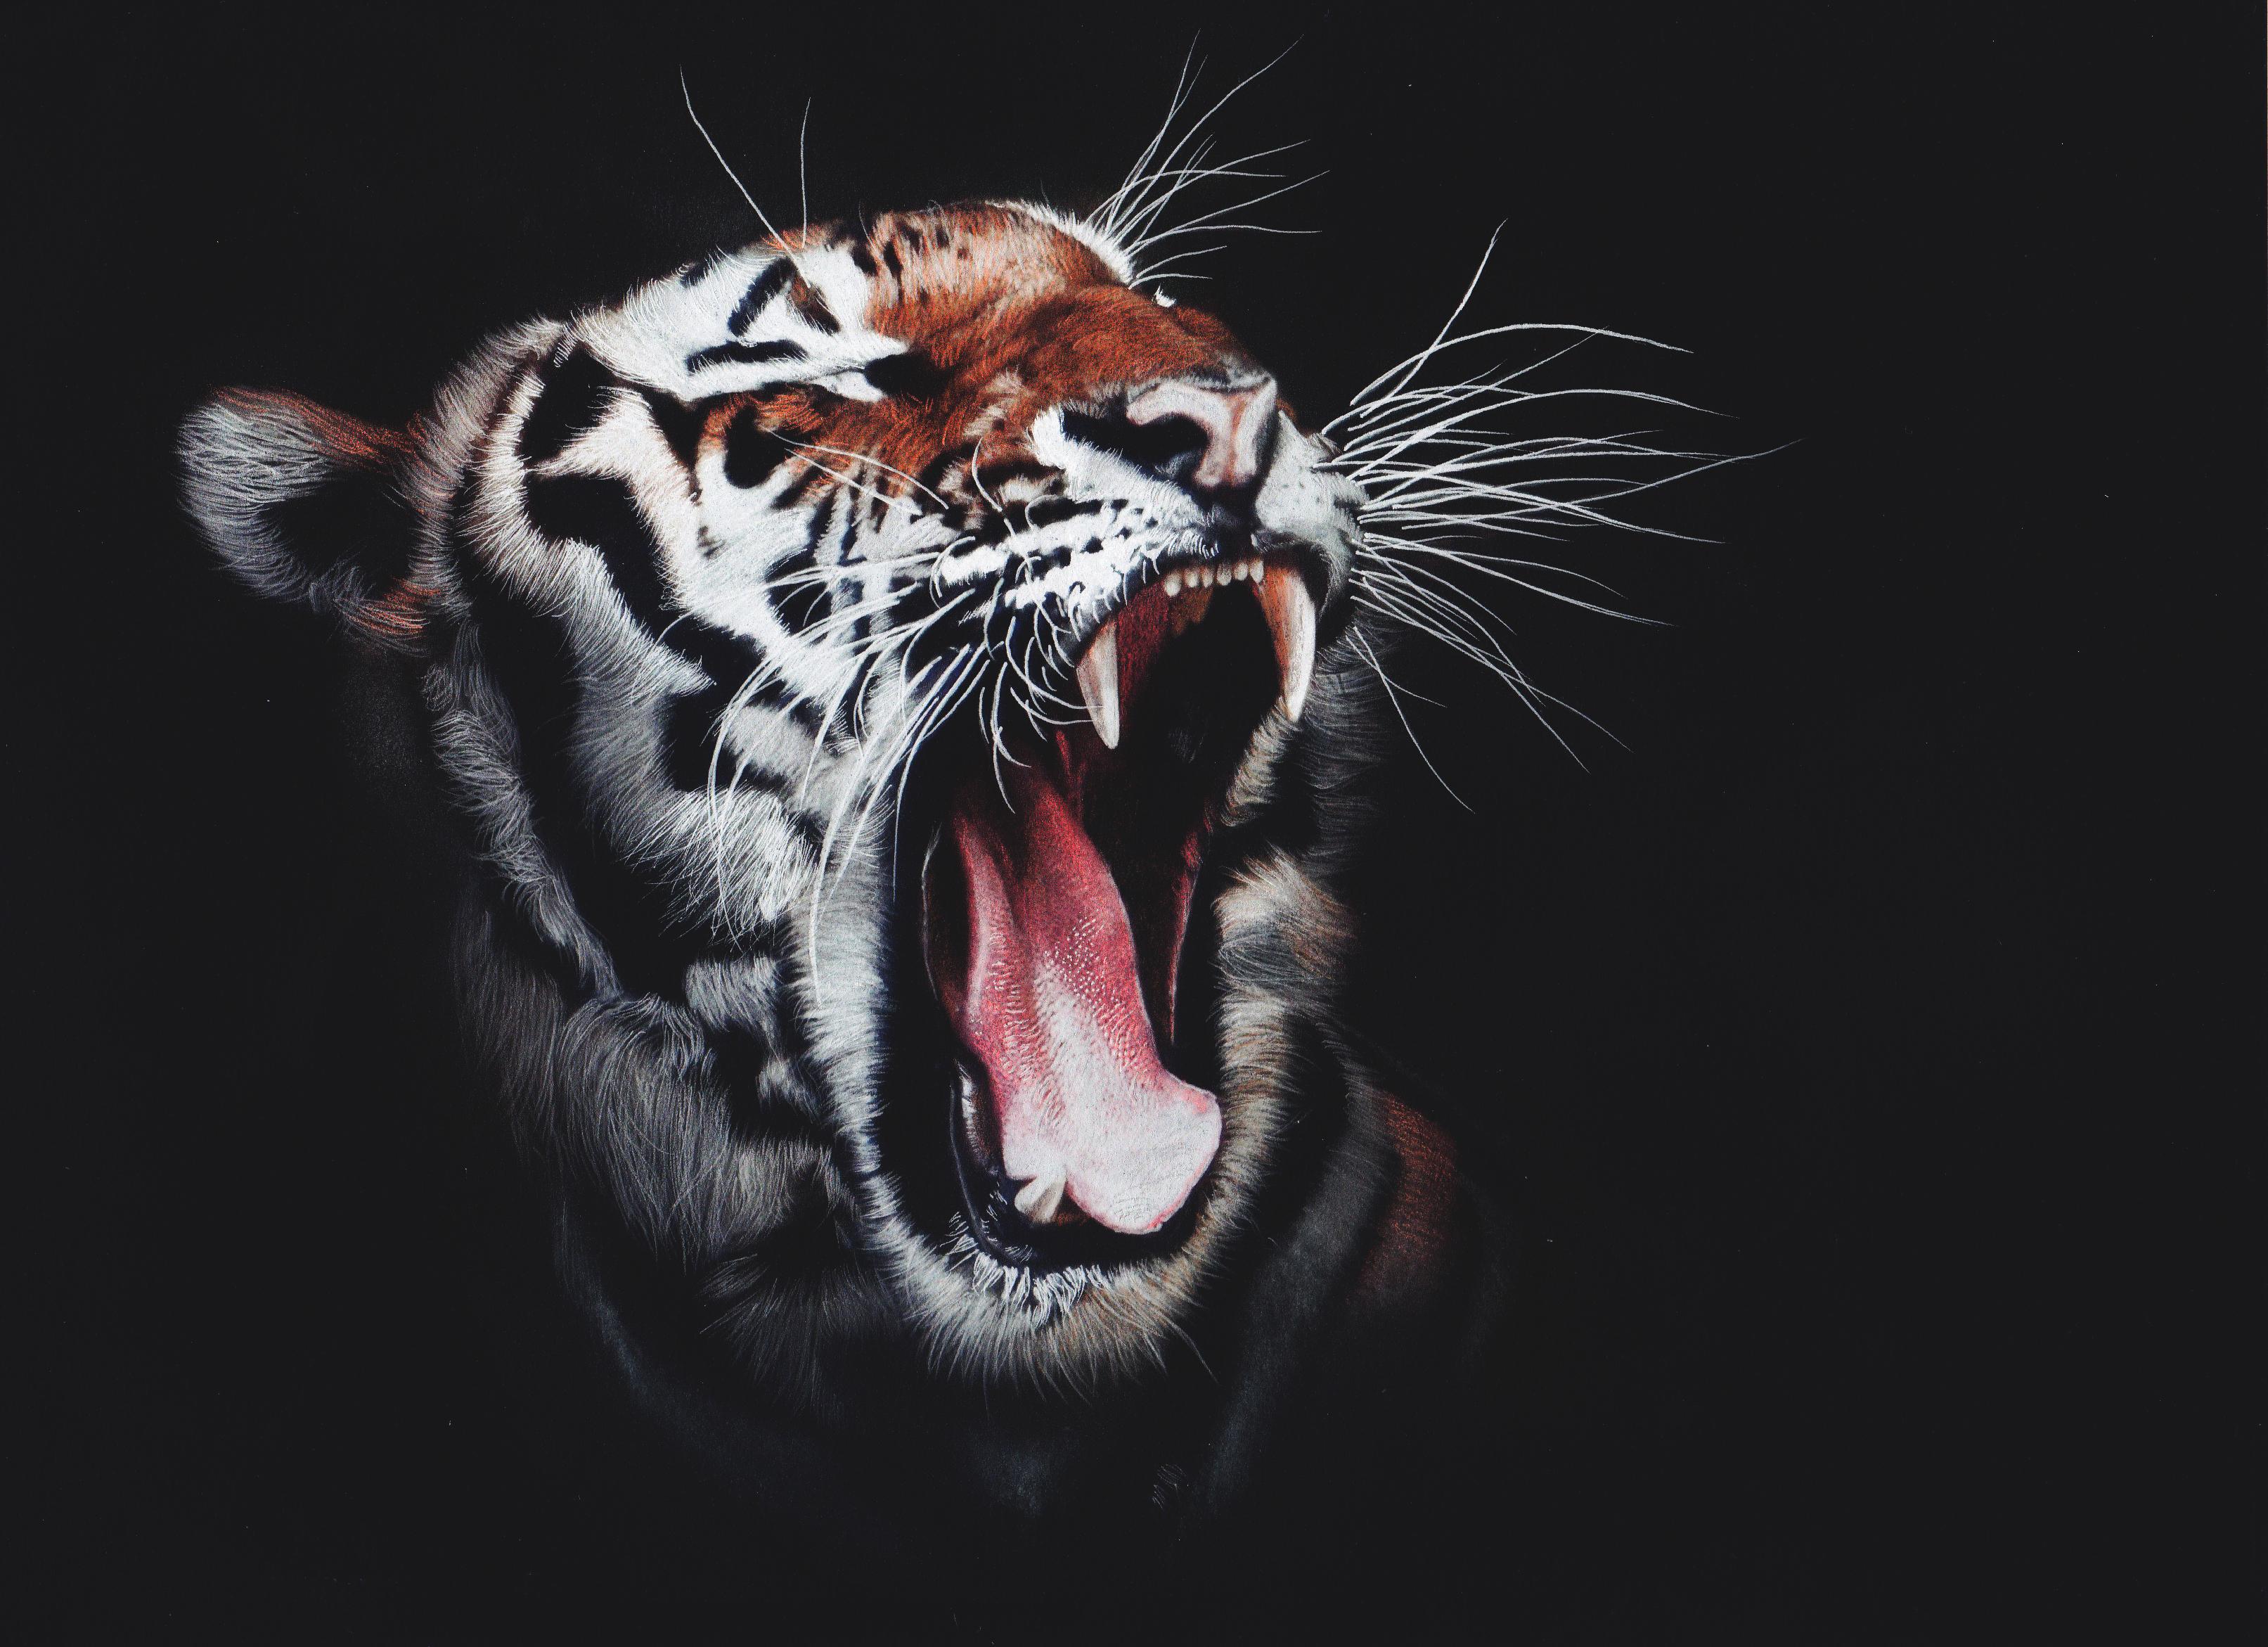 Black Tiger Hd Wallpaper For Mobile